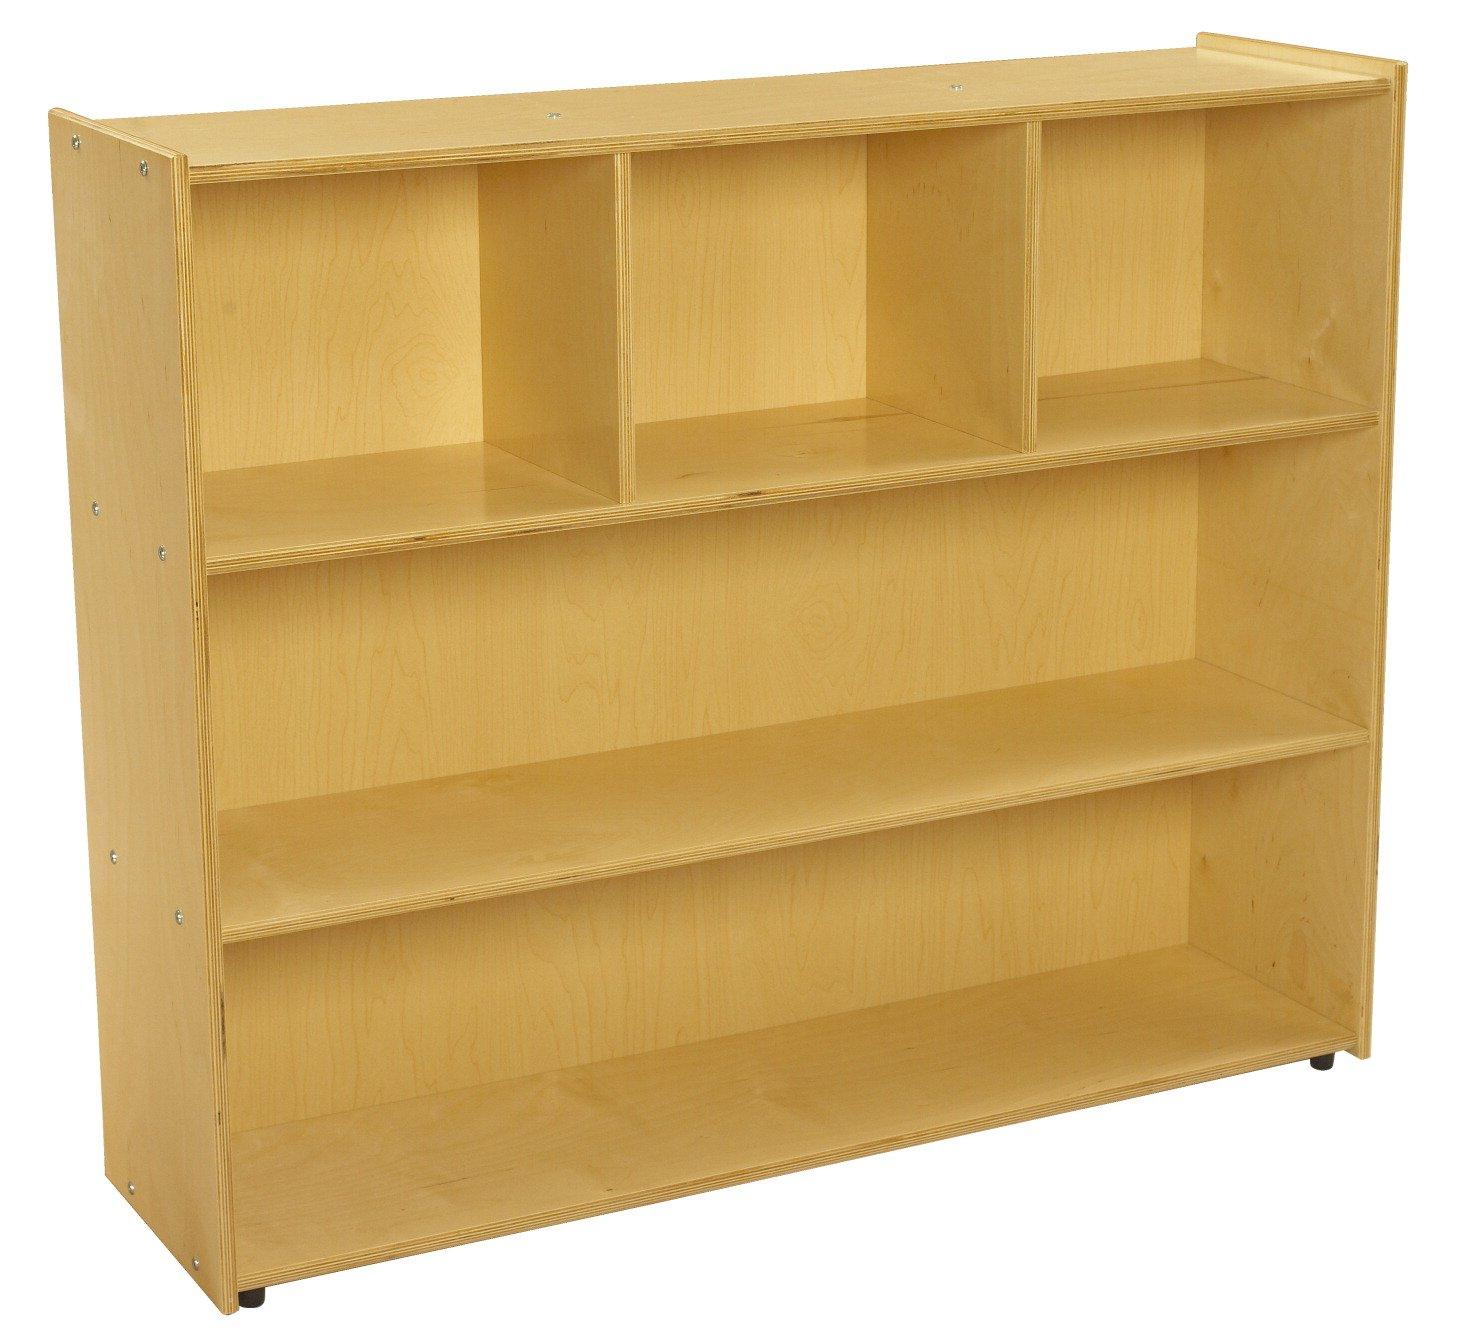 Childcraft ABC Furnishings 3-Shelf Storage Unit, 48 W x 13 D x 40 H in